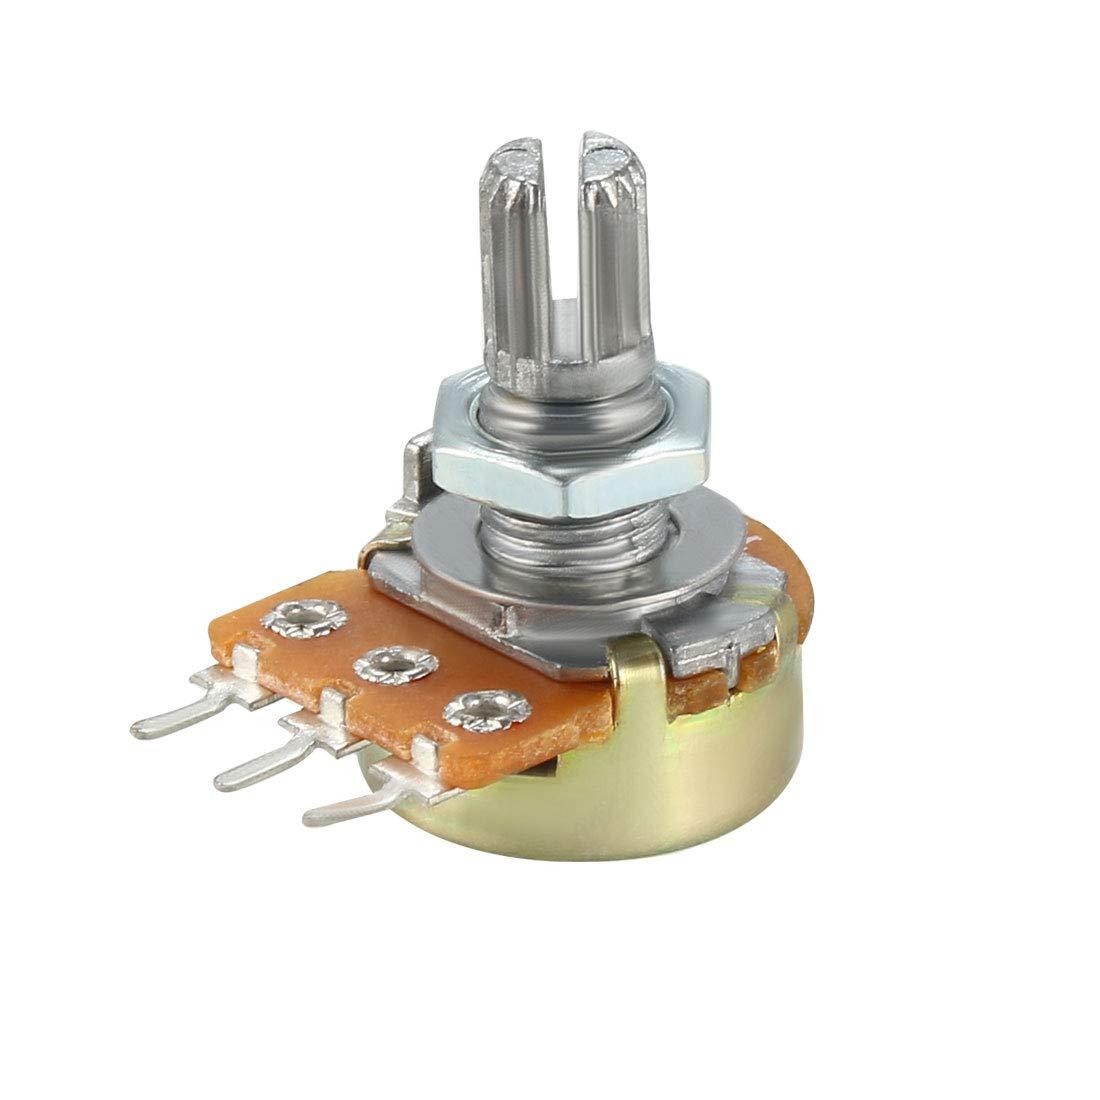 uxcell WH148 Potentiometer Variable Resistors Single Turn Rotary Carbon Film 18pcs 1K,2K 5K 10K 20K 50K 100K 500K 1M Ohm Each 2pcs